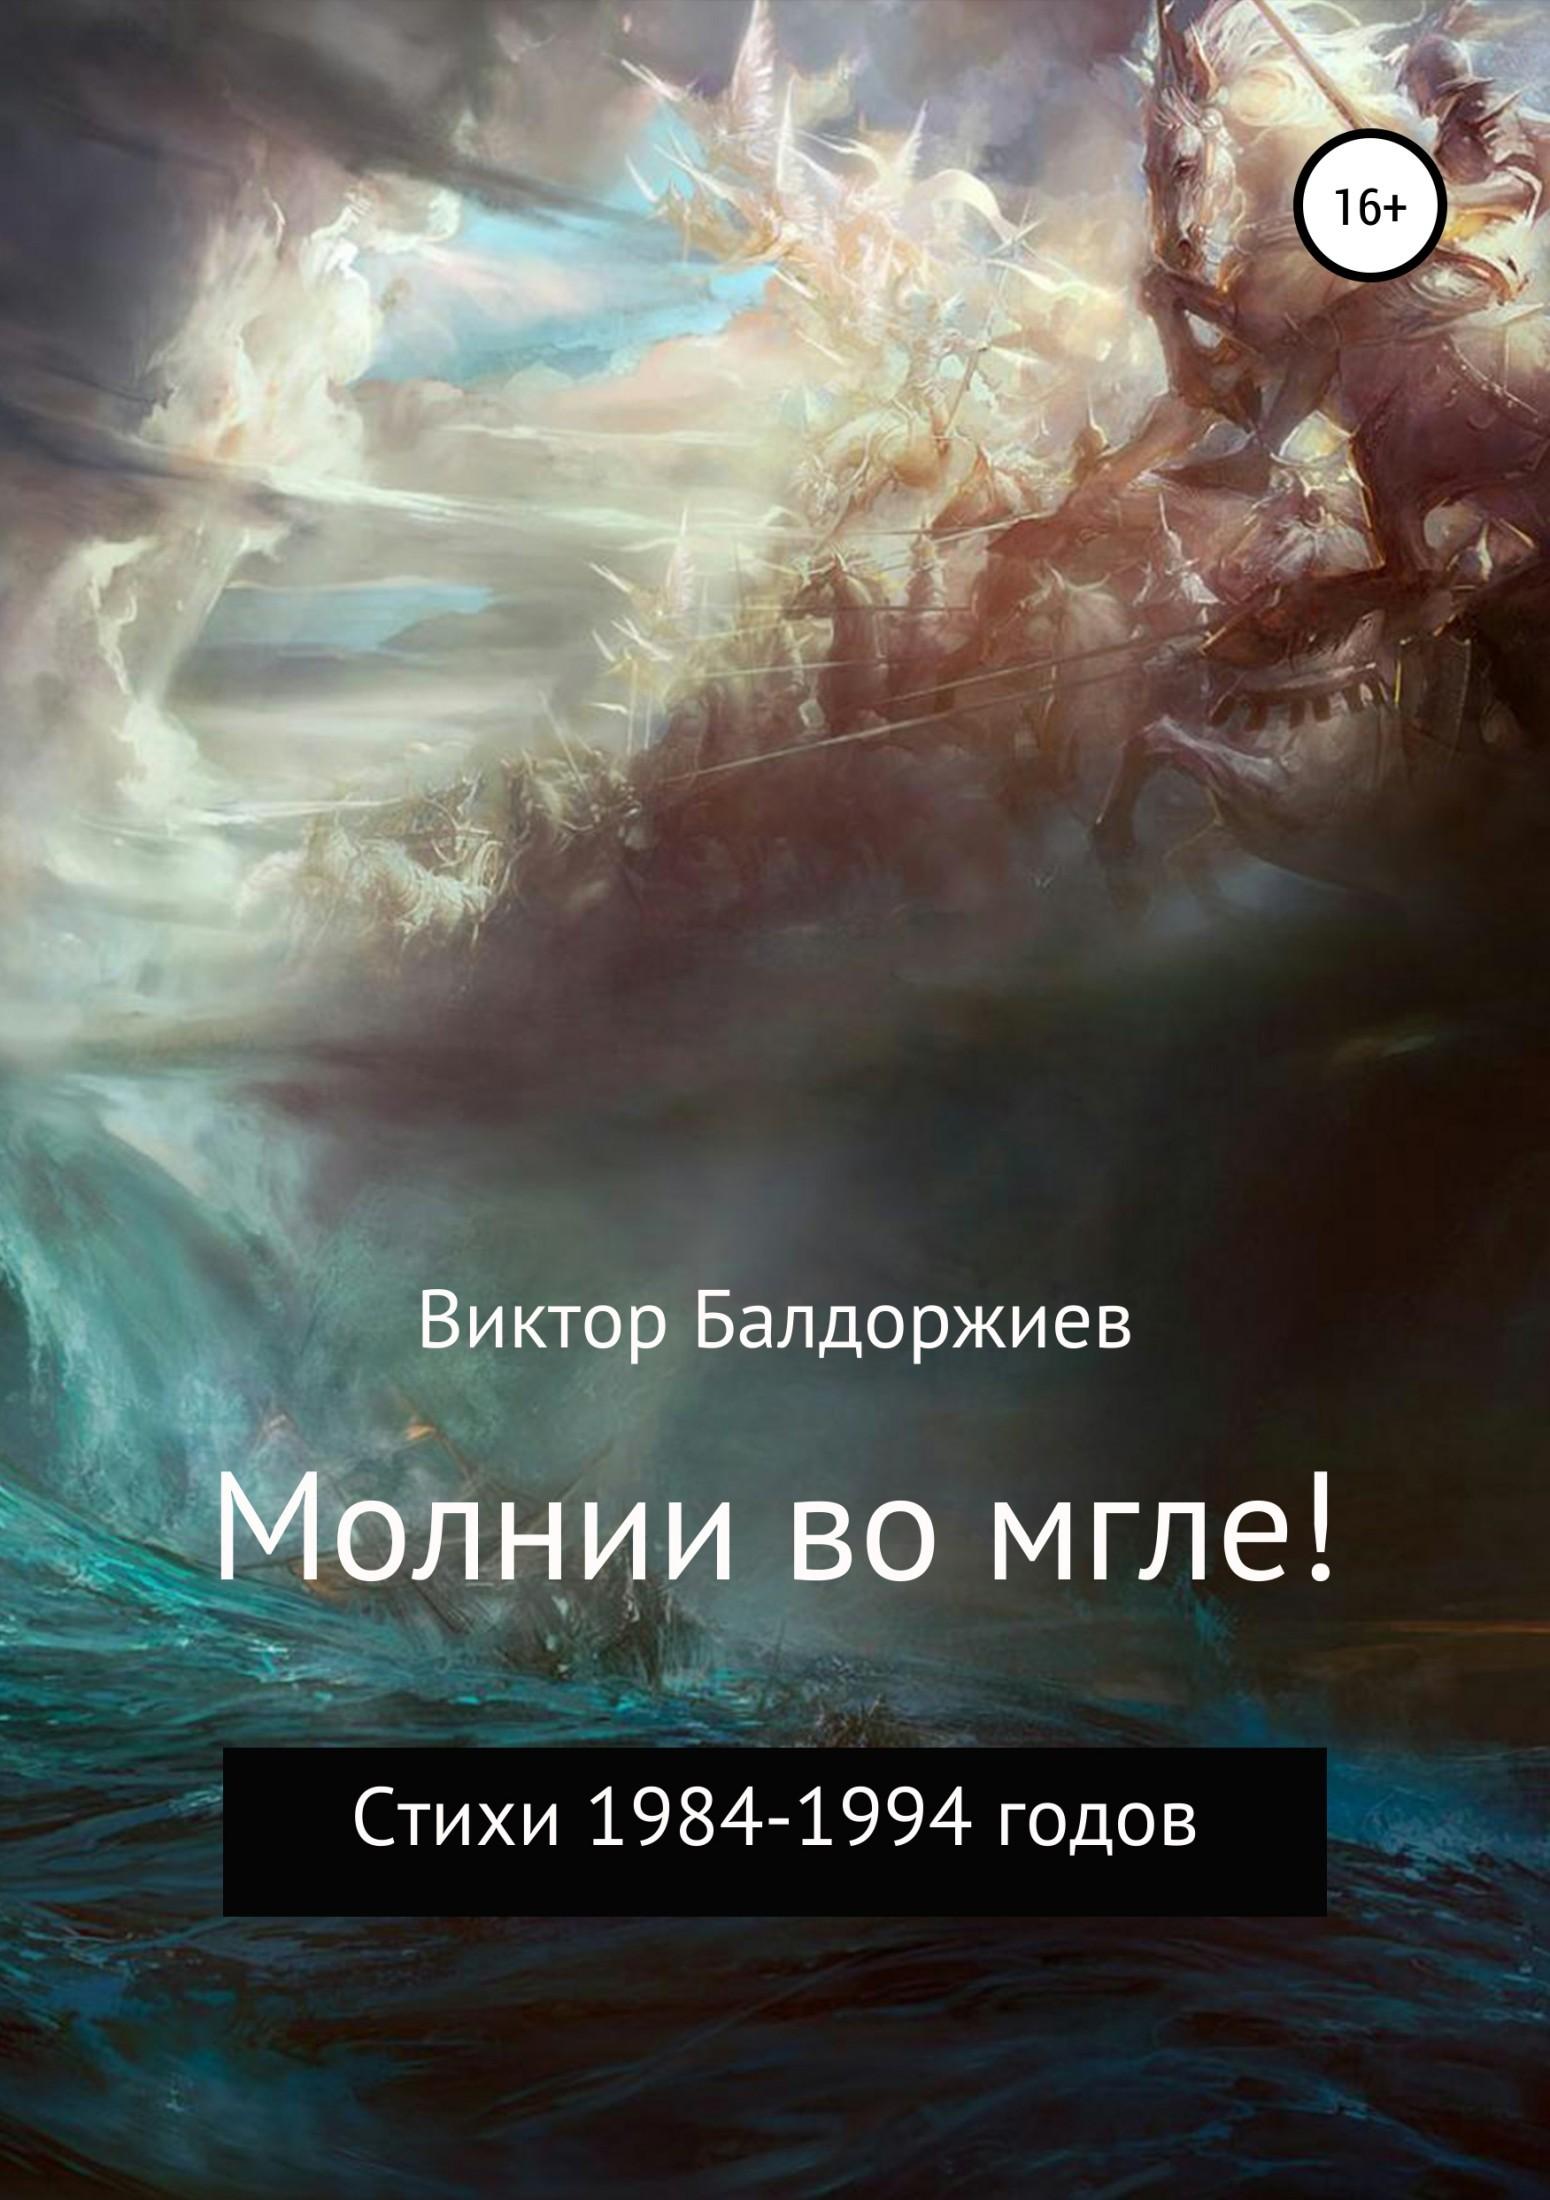 Виктор Балдоржиев Молнии во мгле!